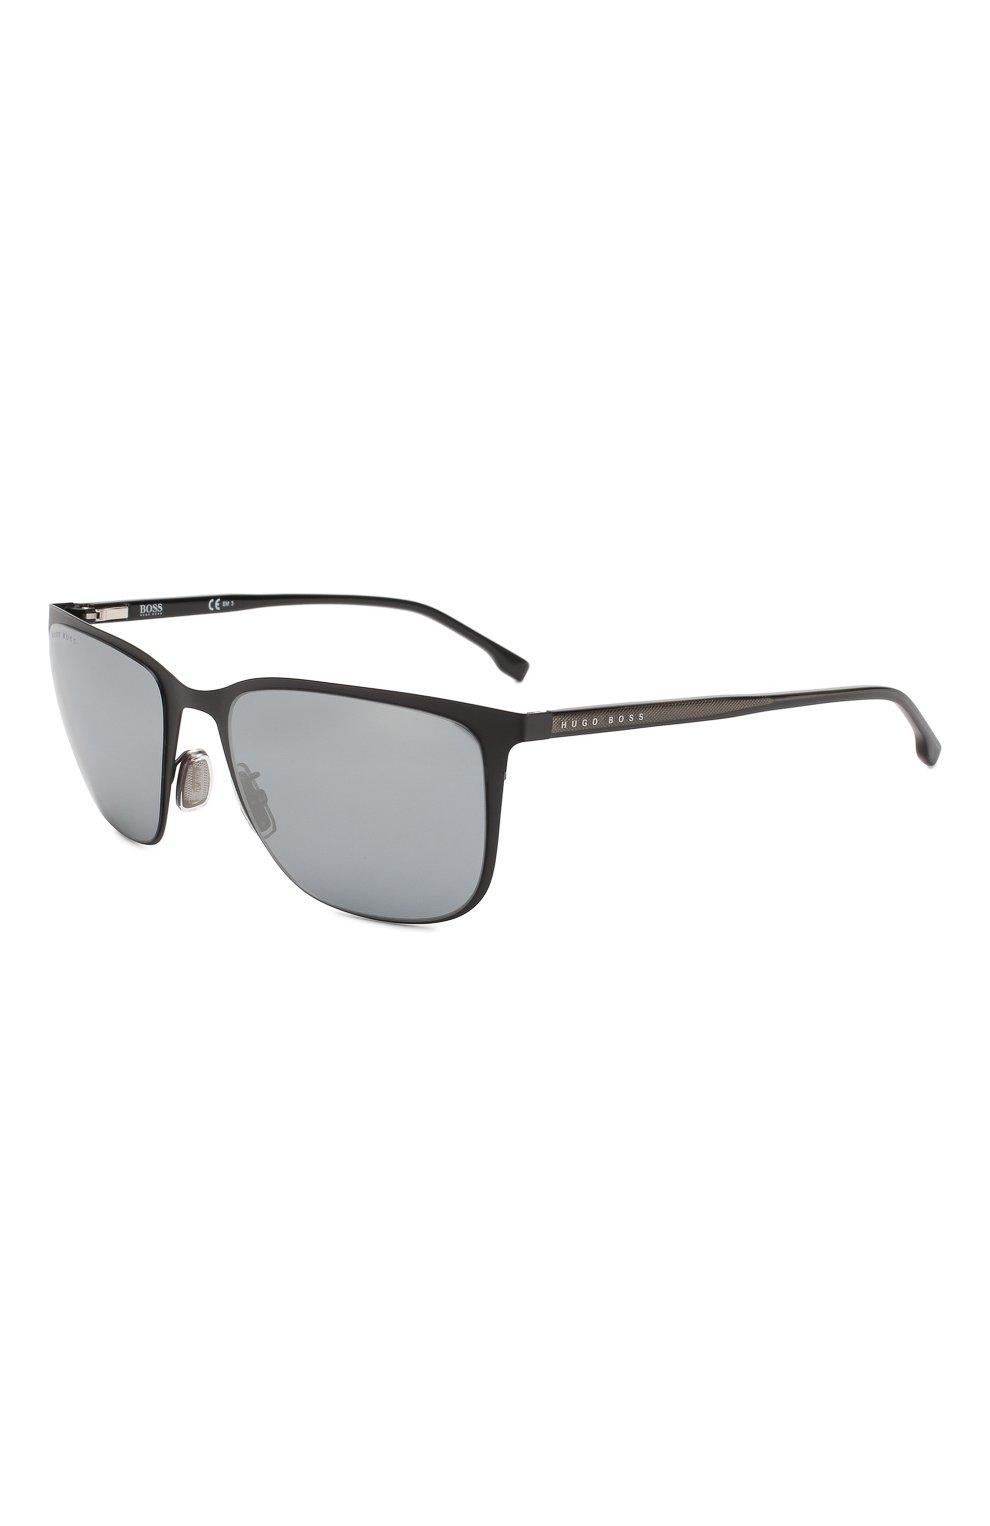 Мужские солнцезащитные очки BOSS черного цвета, арт. 1062/F 003 | Фото 1